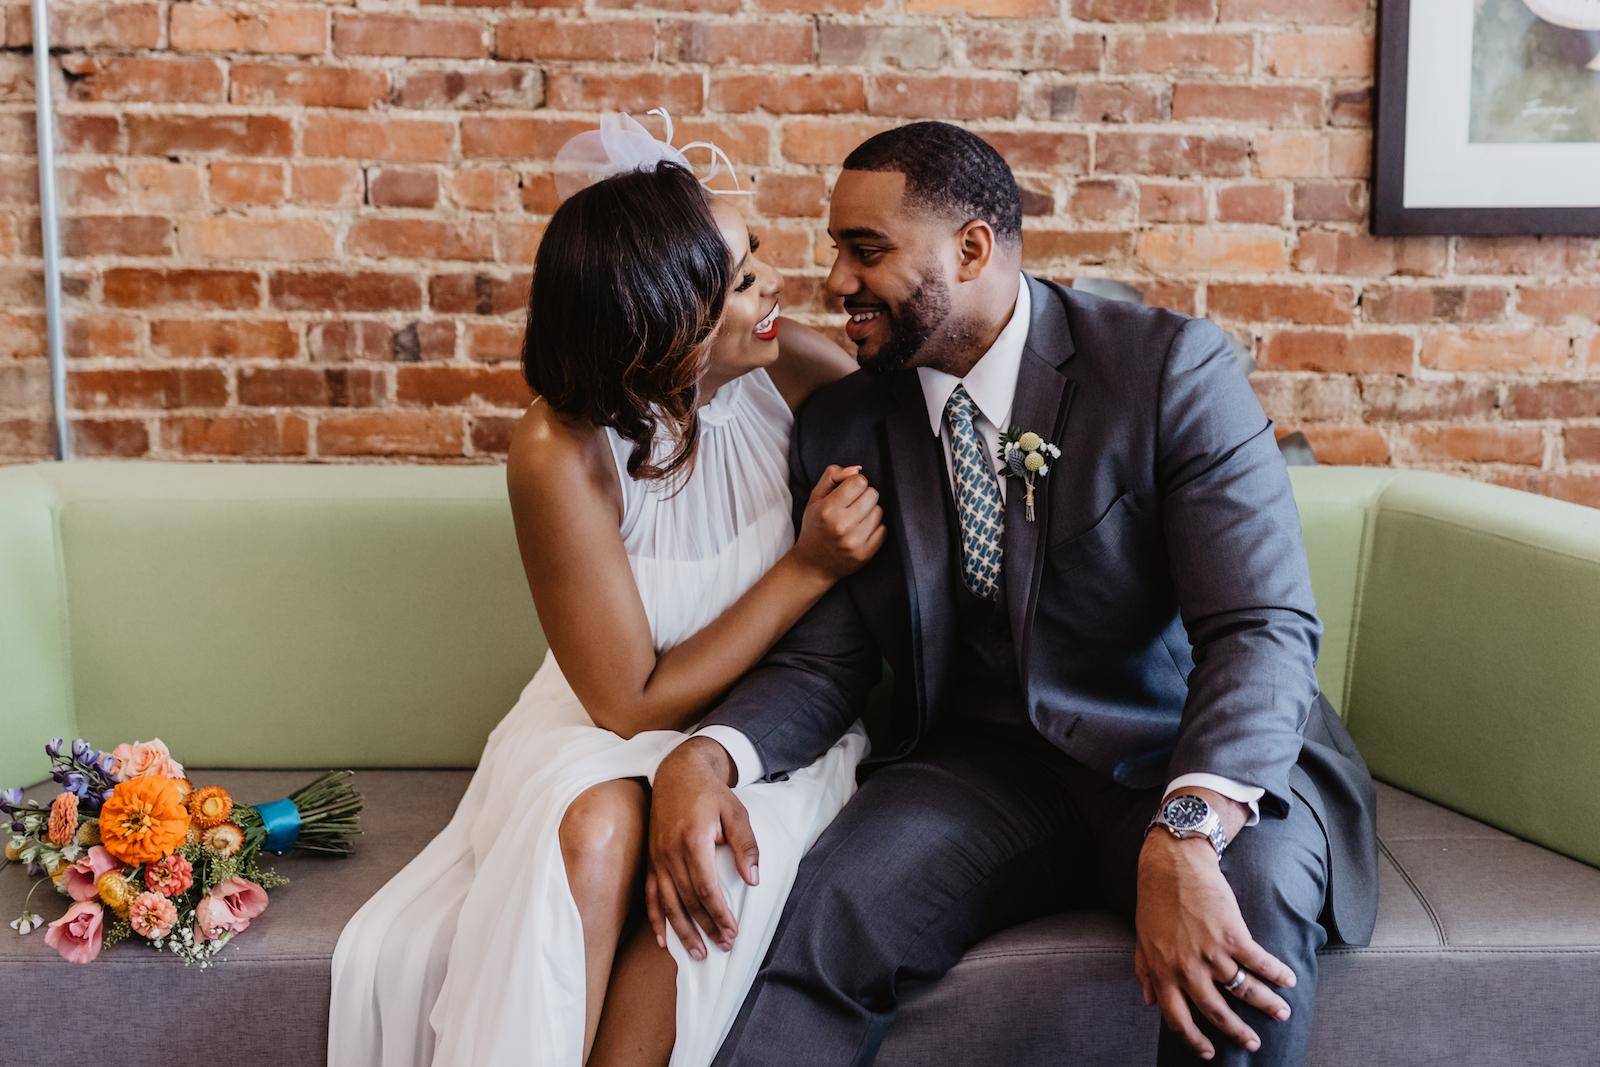 Music City Merger wedding inspiration featured on Nashville Bride Guide